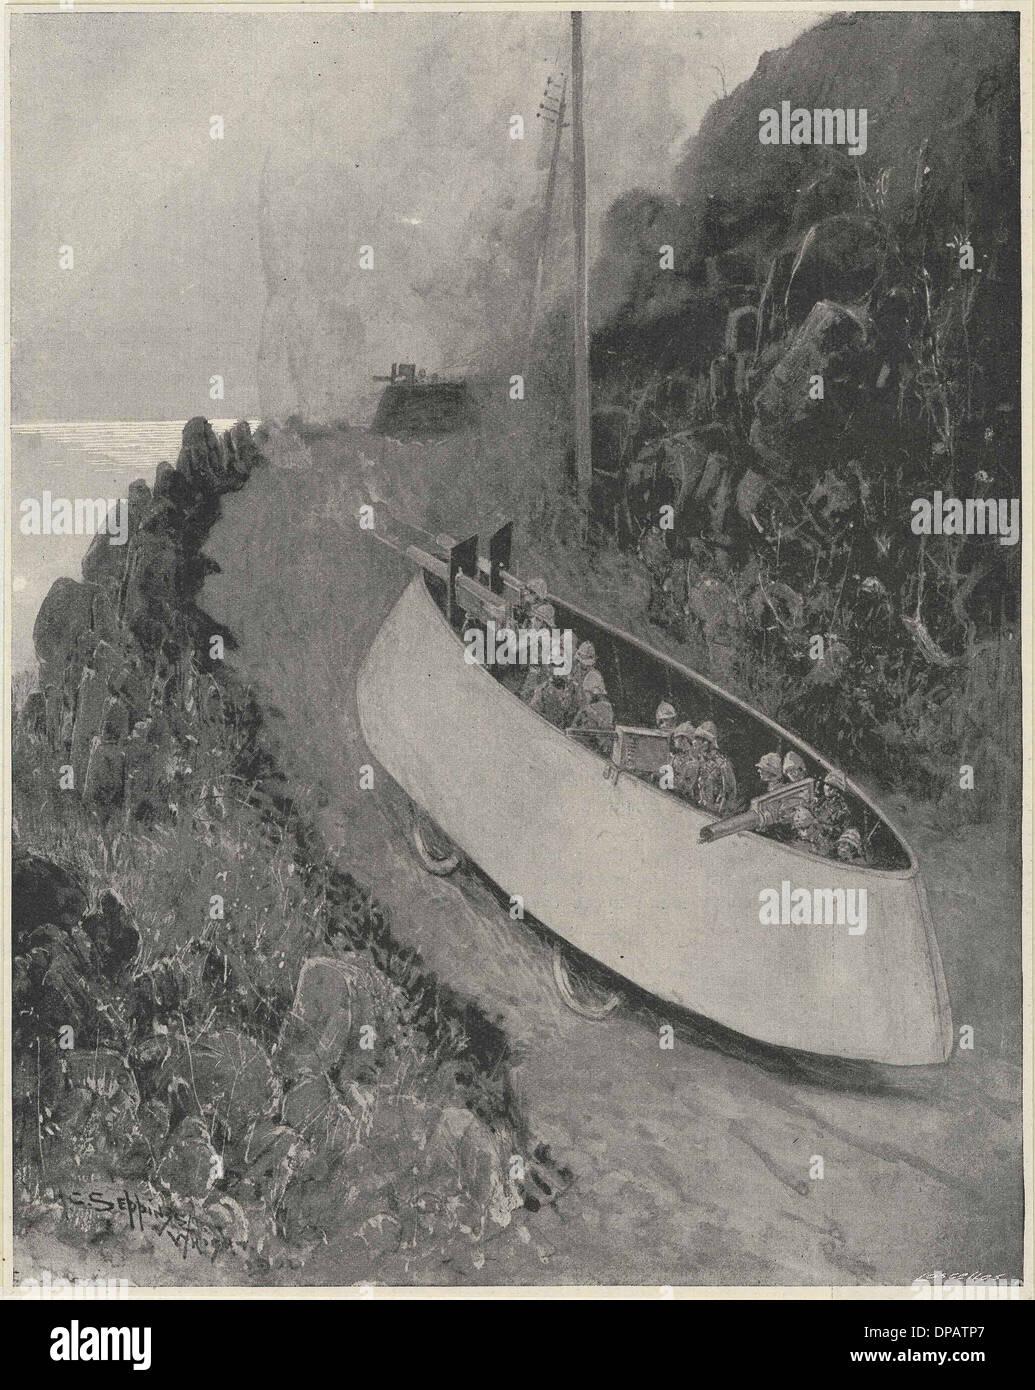 SIMMS' WAR MOTOR 1902 - Stock Image